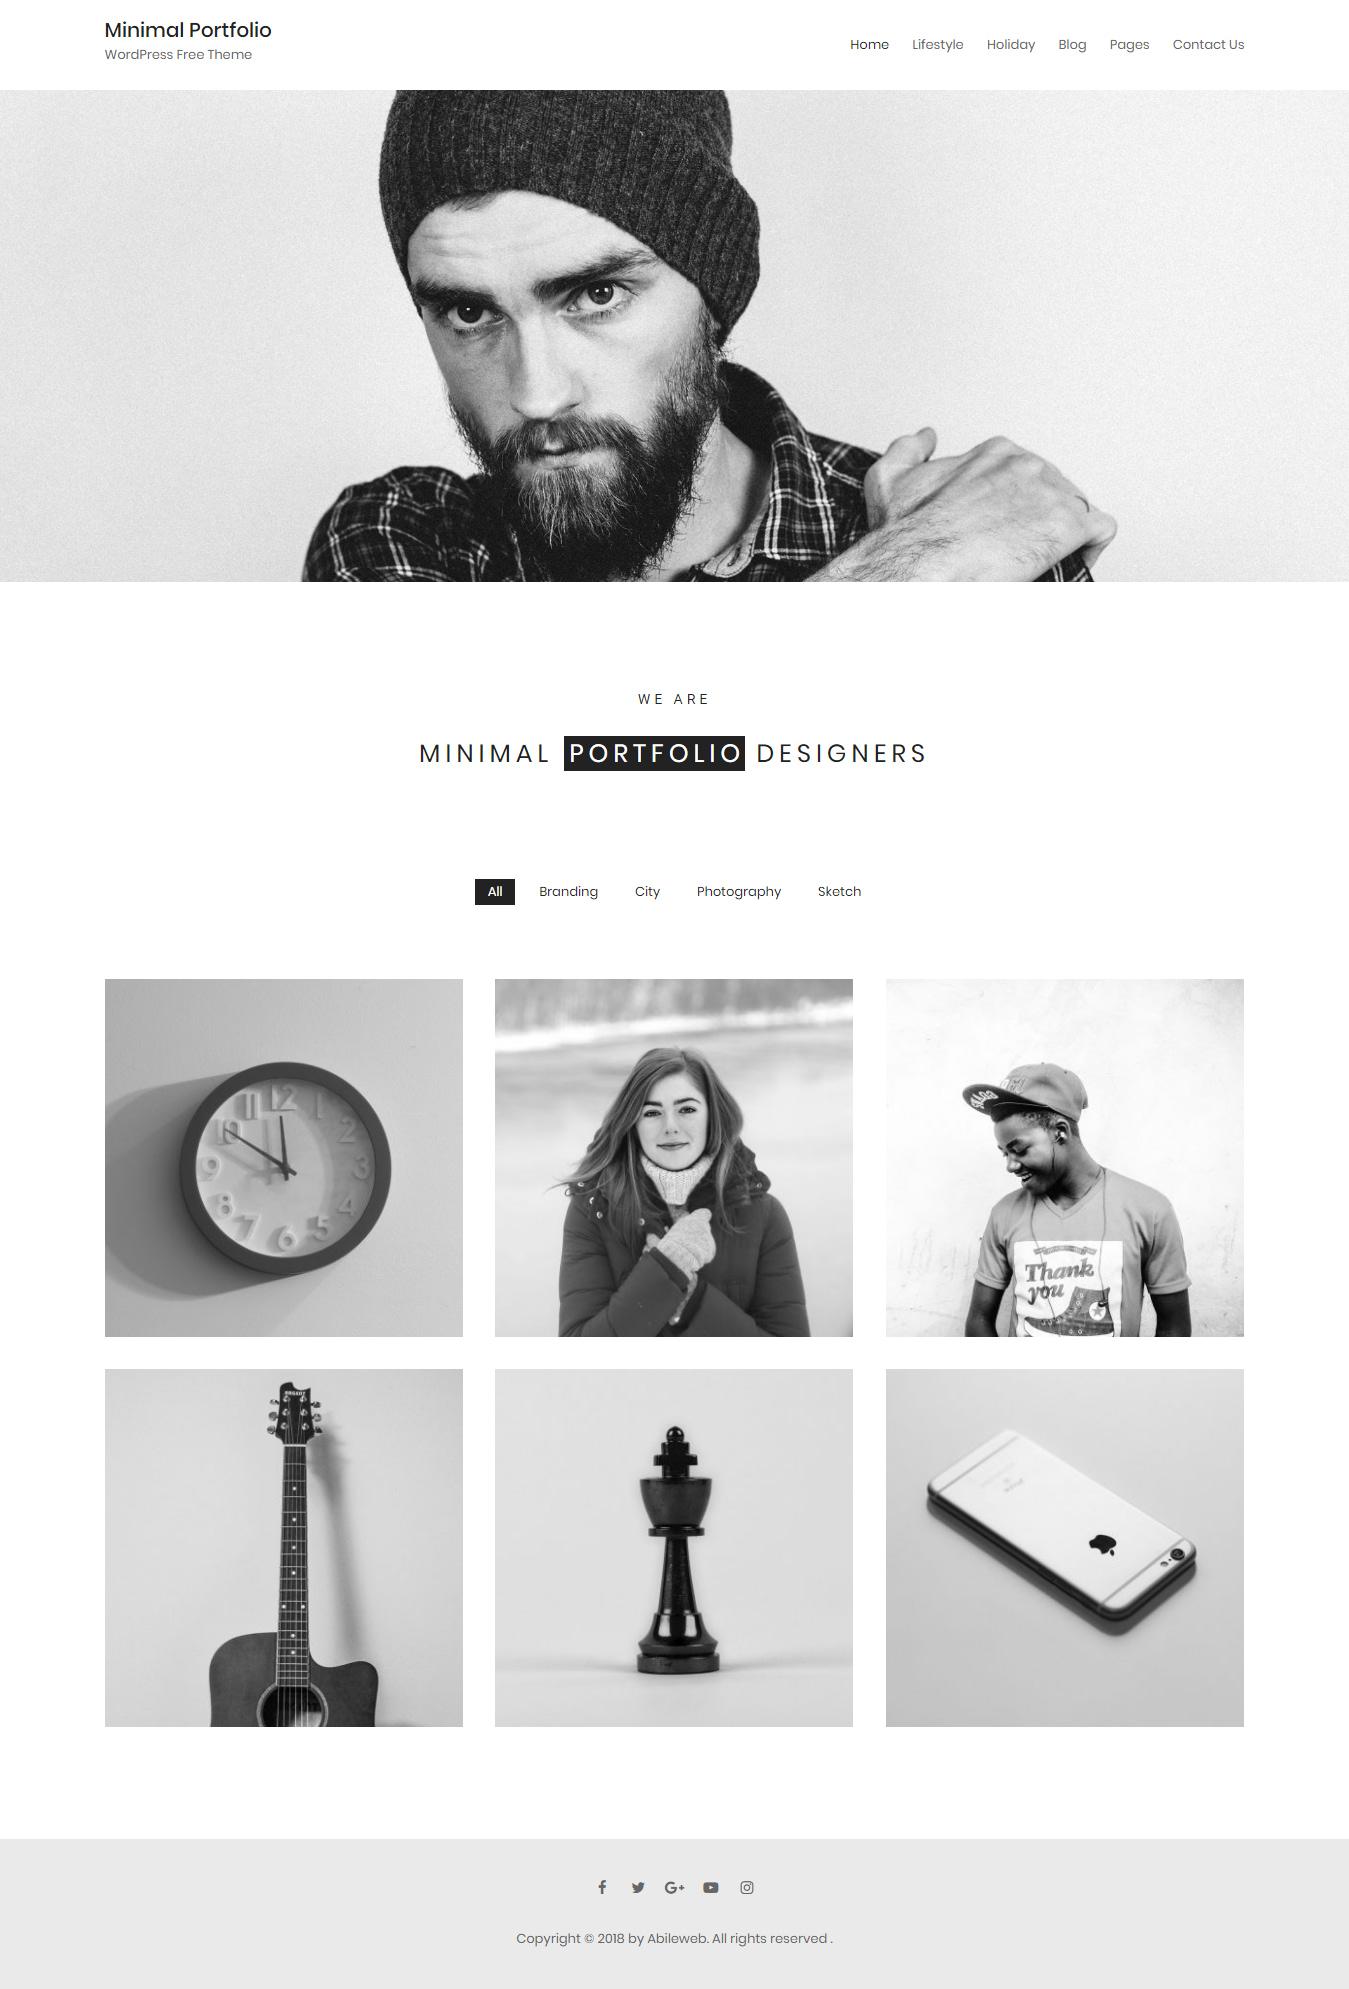 Minimal Portfolio - Best Free Minimal WordPress Theme